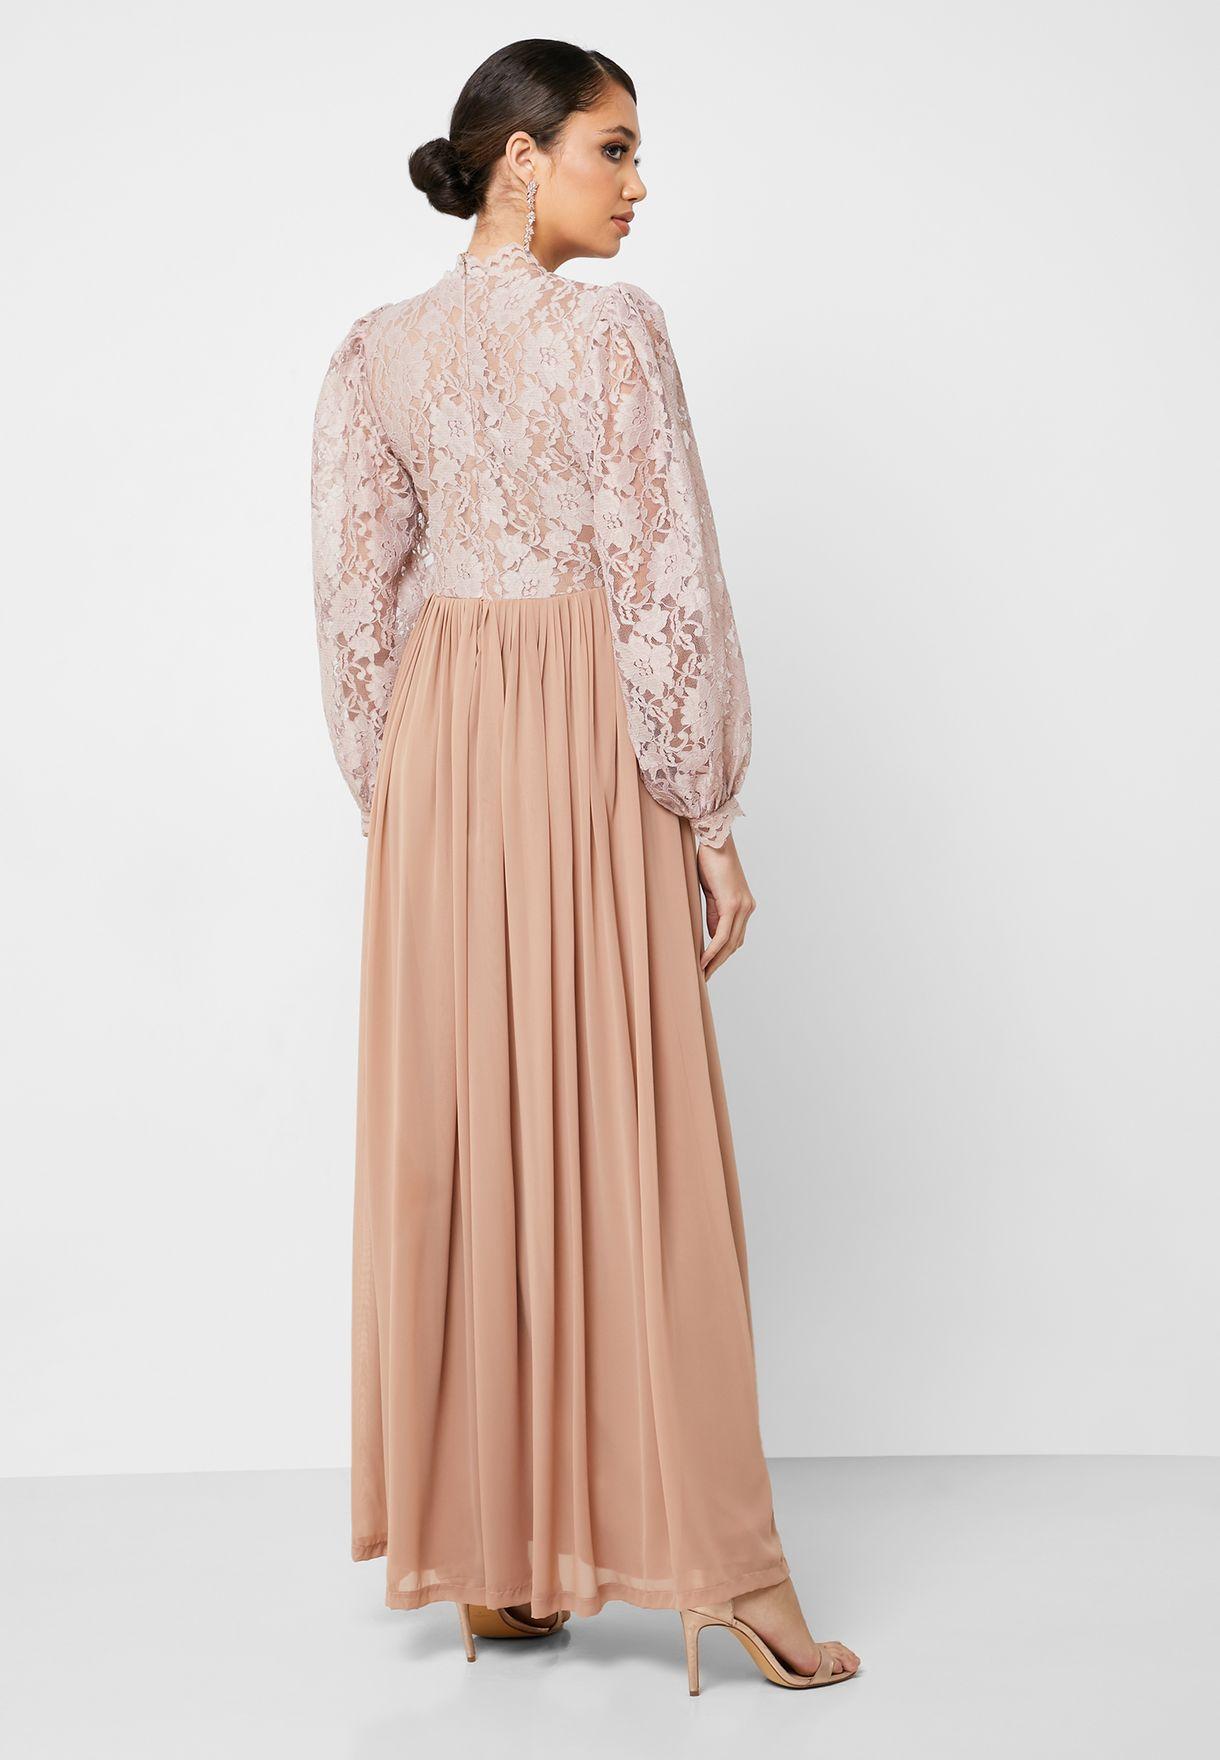 Lace Top Maxi Dress